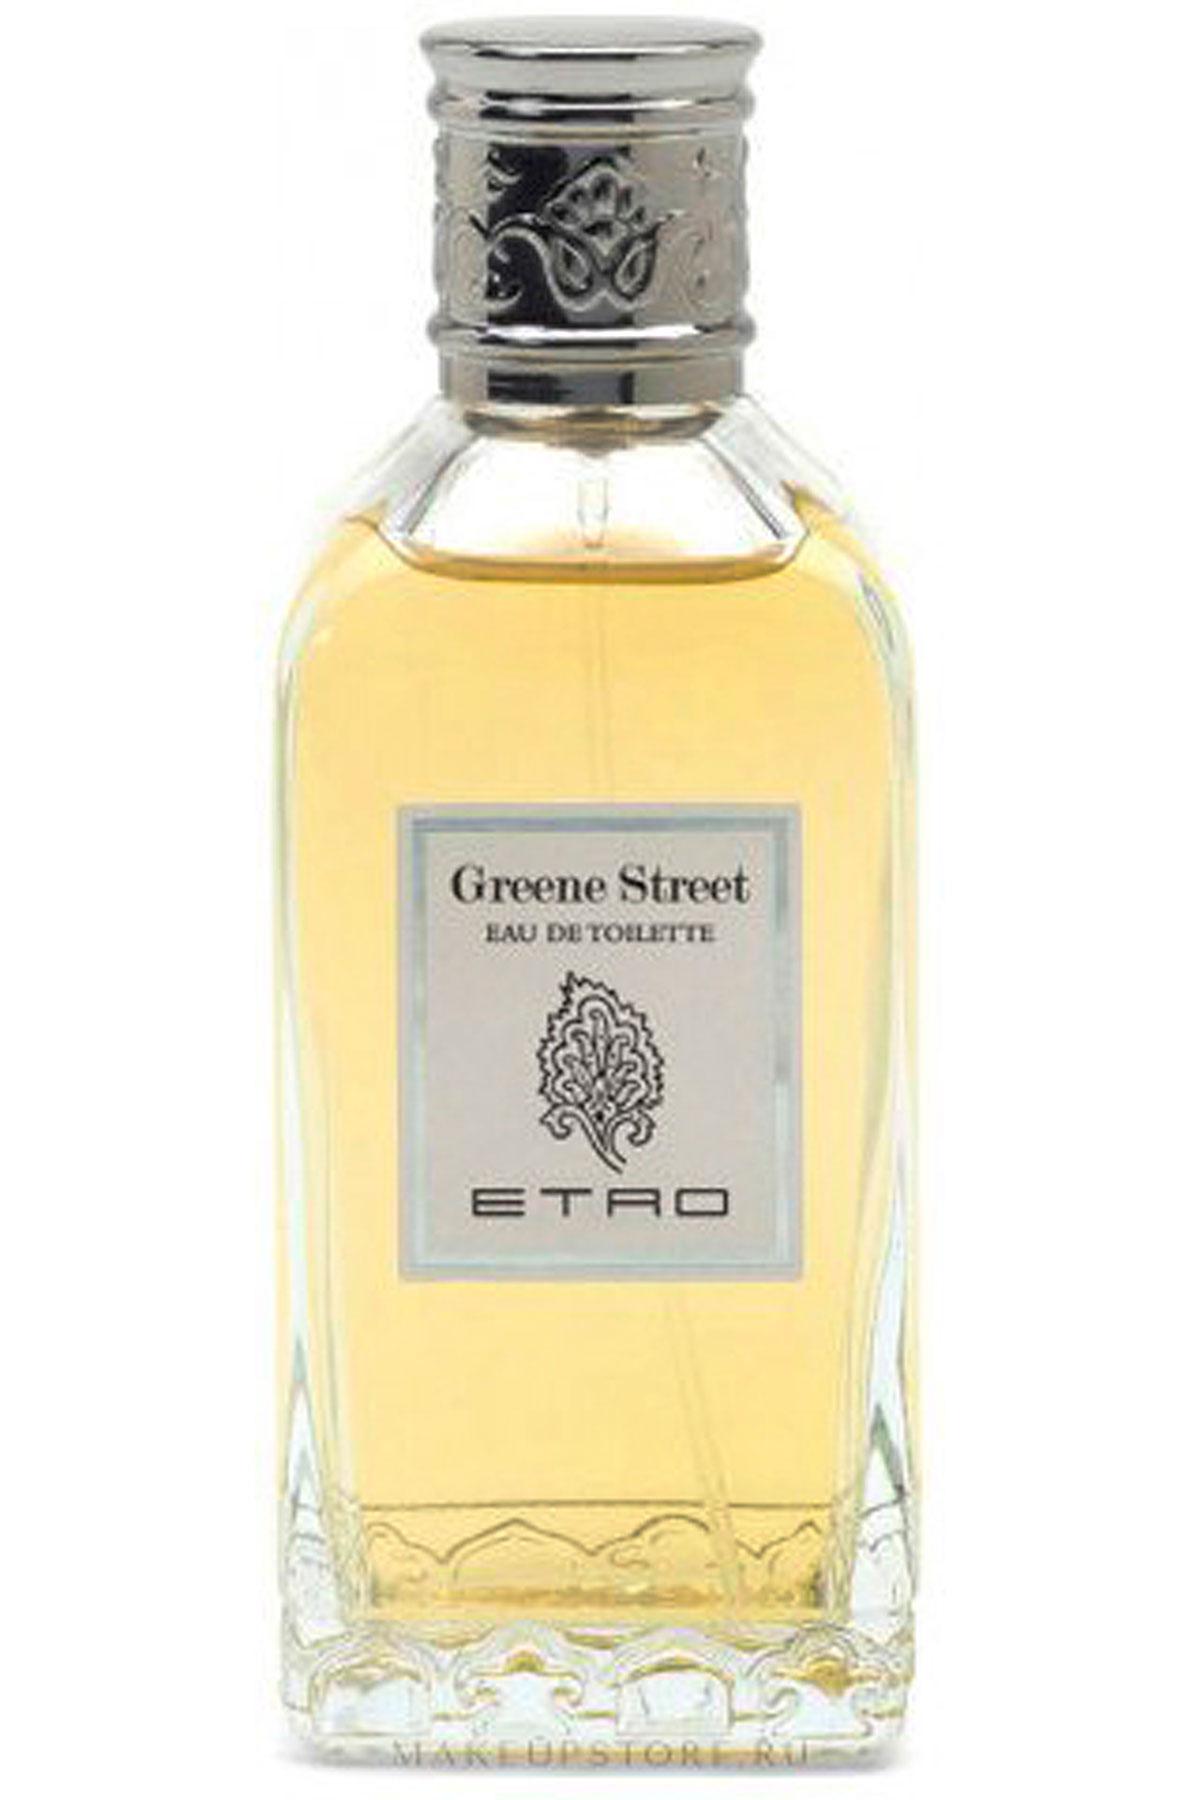 Etro Fragrances for Men On Sale, Greene Street - Eau De Toilette - 100 Ml, 2019, 100 ml